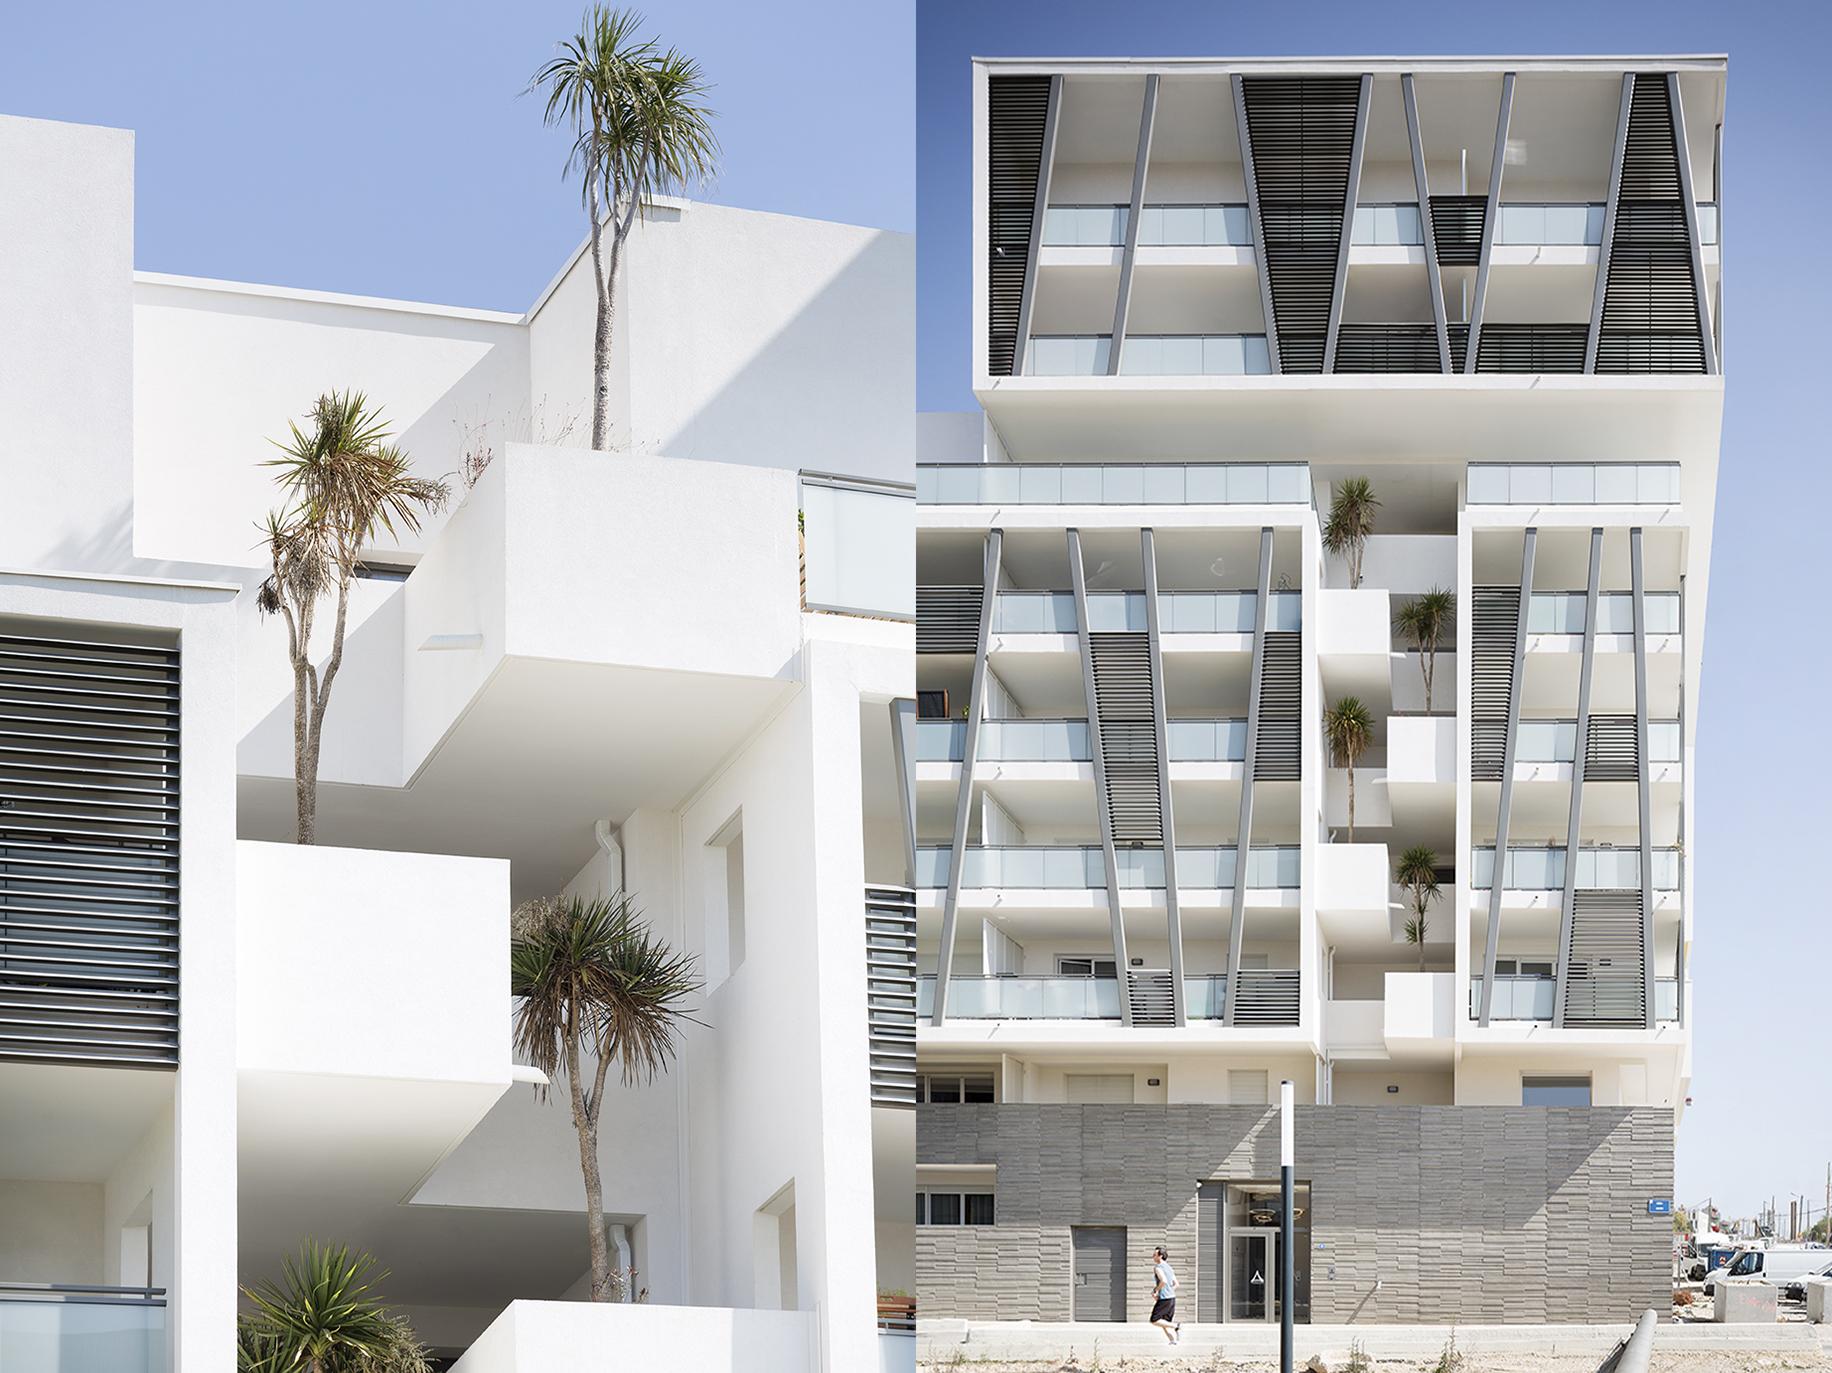 mc-lucat-residence-@tmosph'air-imagine-architectes-